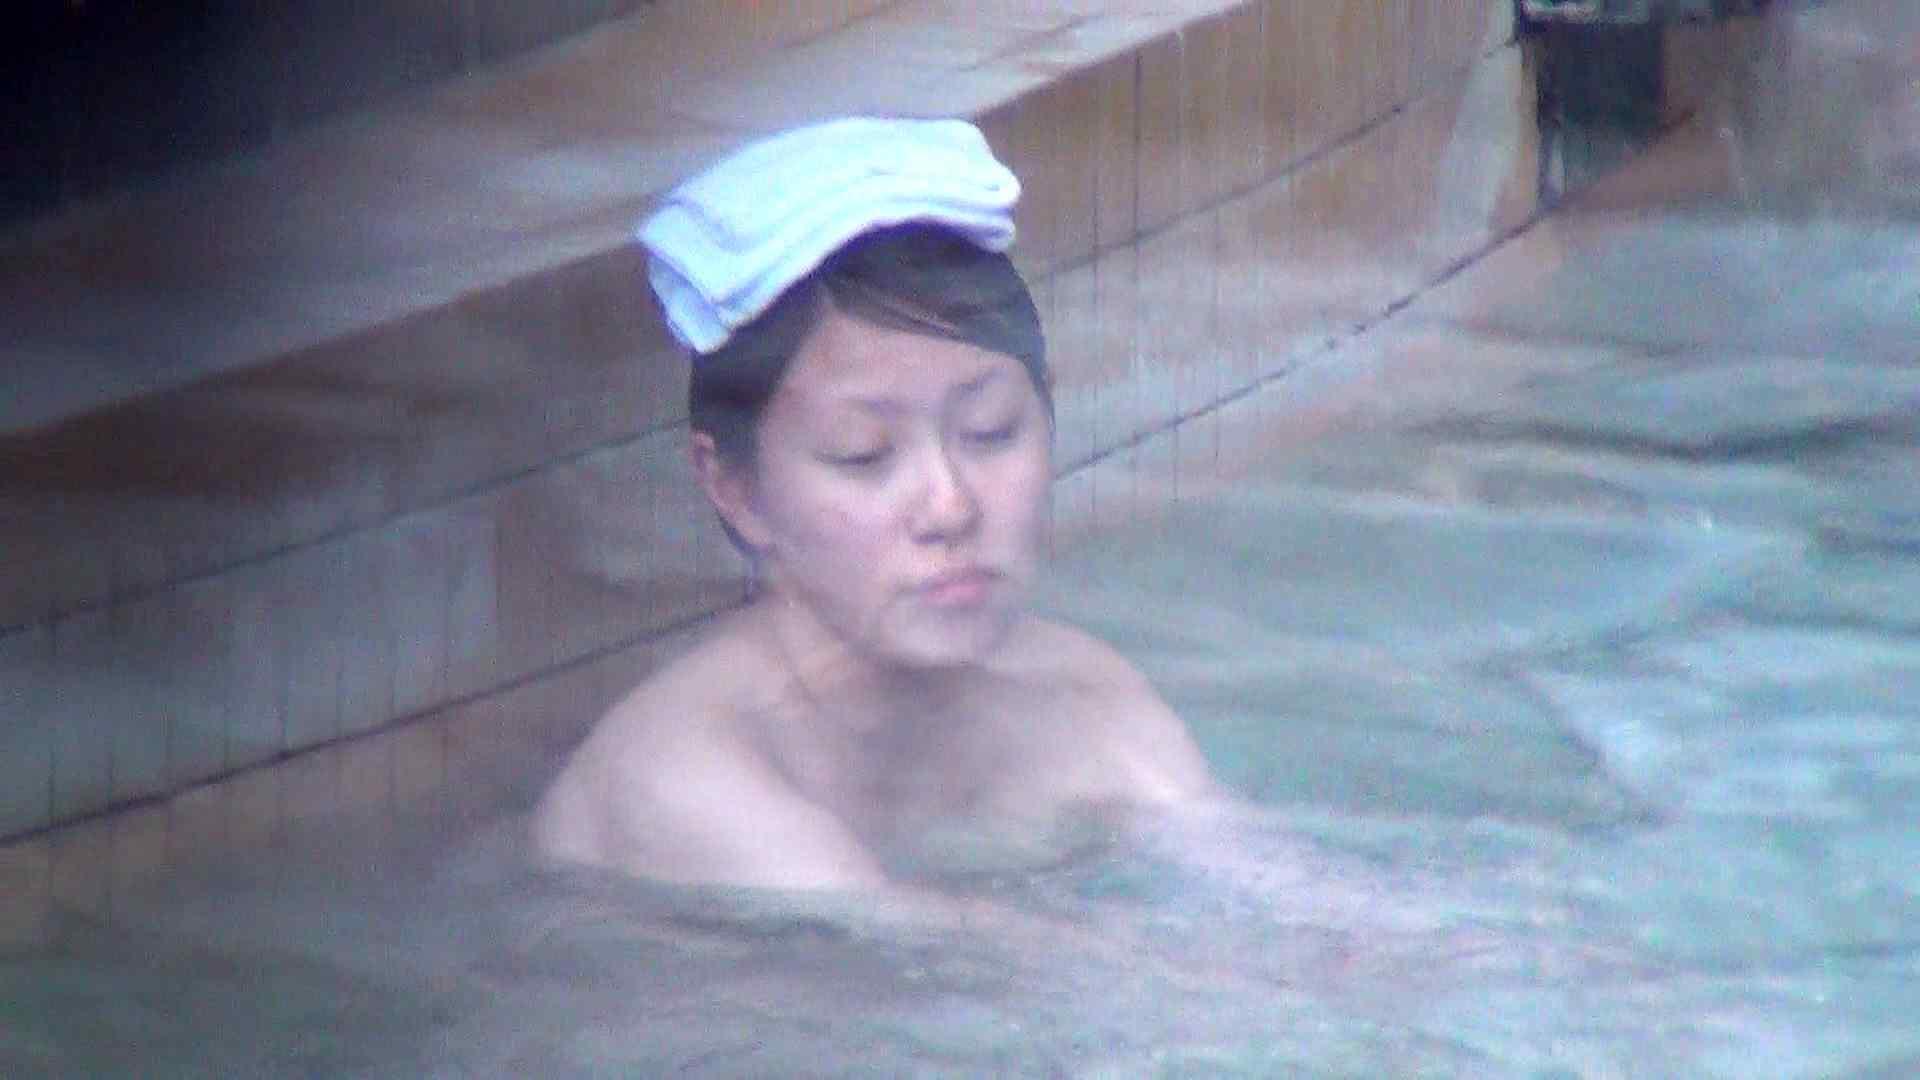 Aquaな露天風呂Vol.289 OLのプライベート ワレメ無修正動画無料 13pic 5